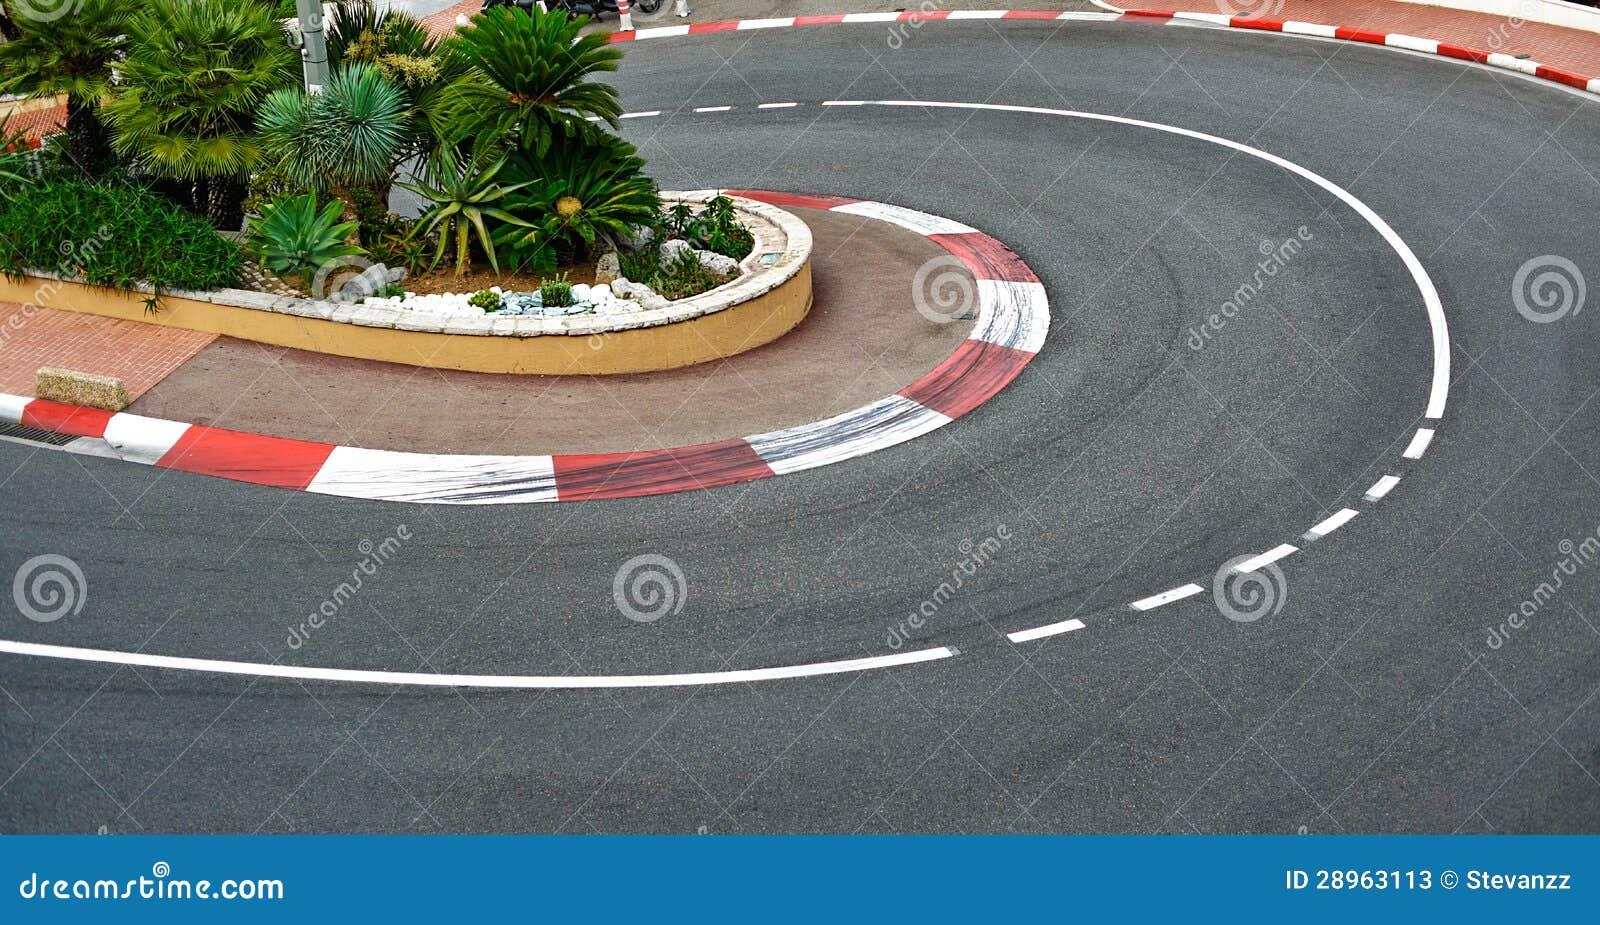 Old Station hairpin bend race asphalt, Monaco Grand Prix circuit